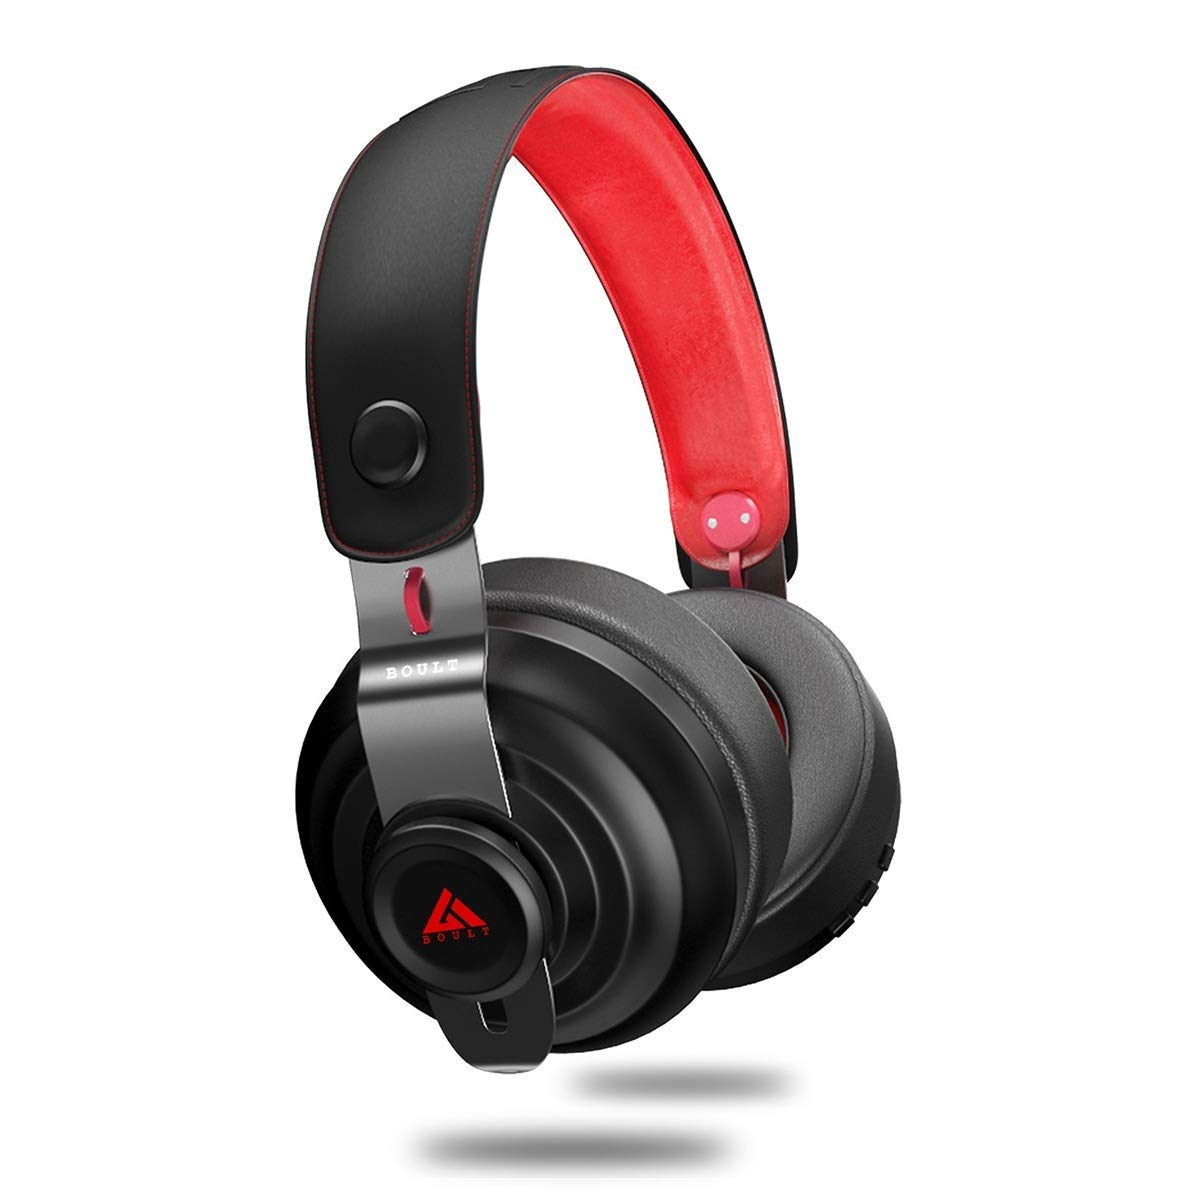 Boult Audio Pro bass Boost Over-Ear Wireless Bluetooth Headphones